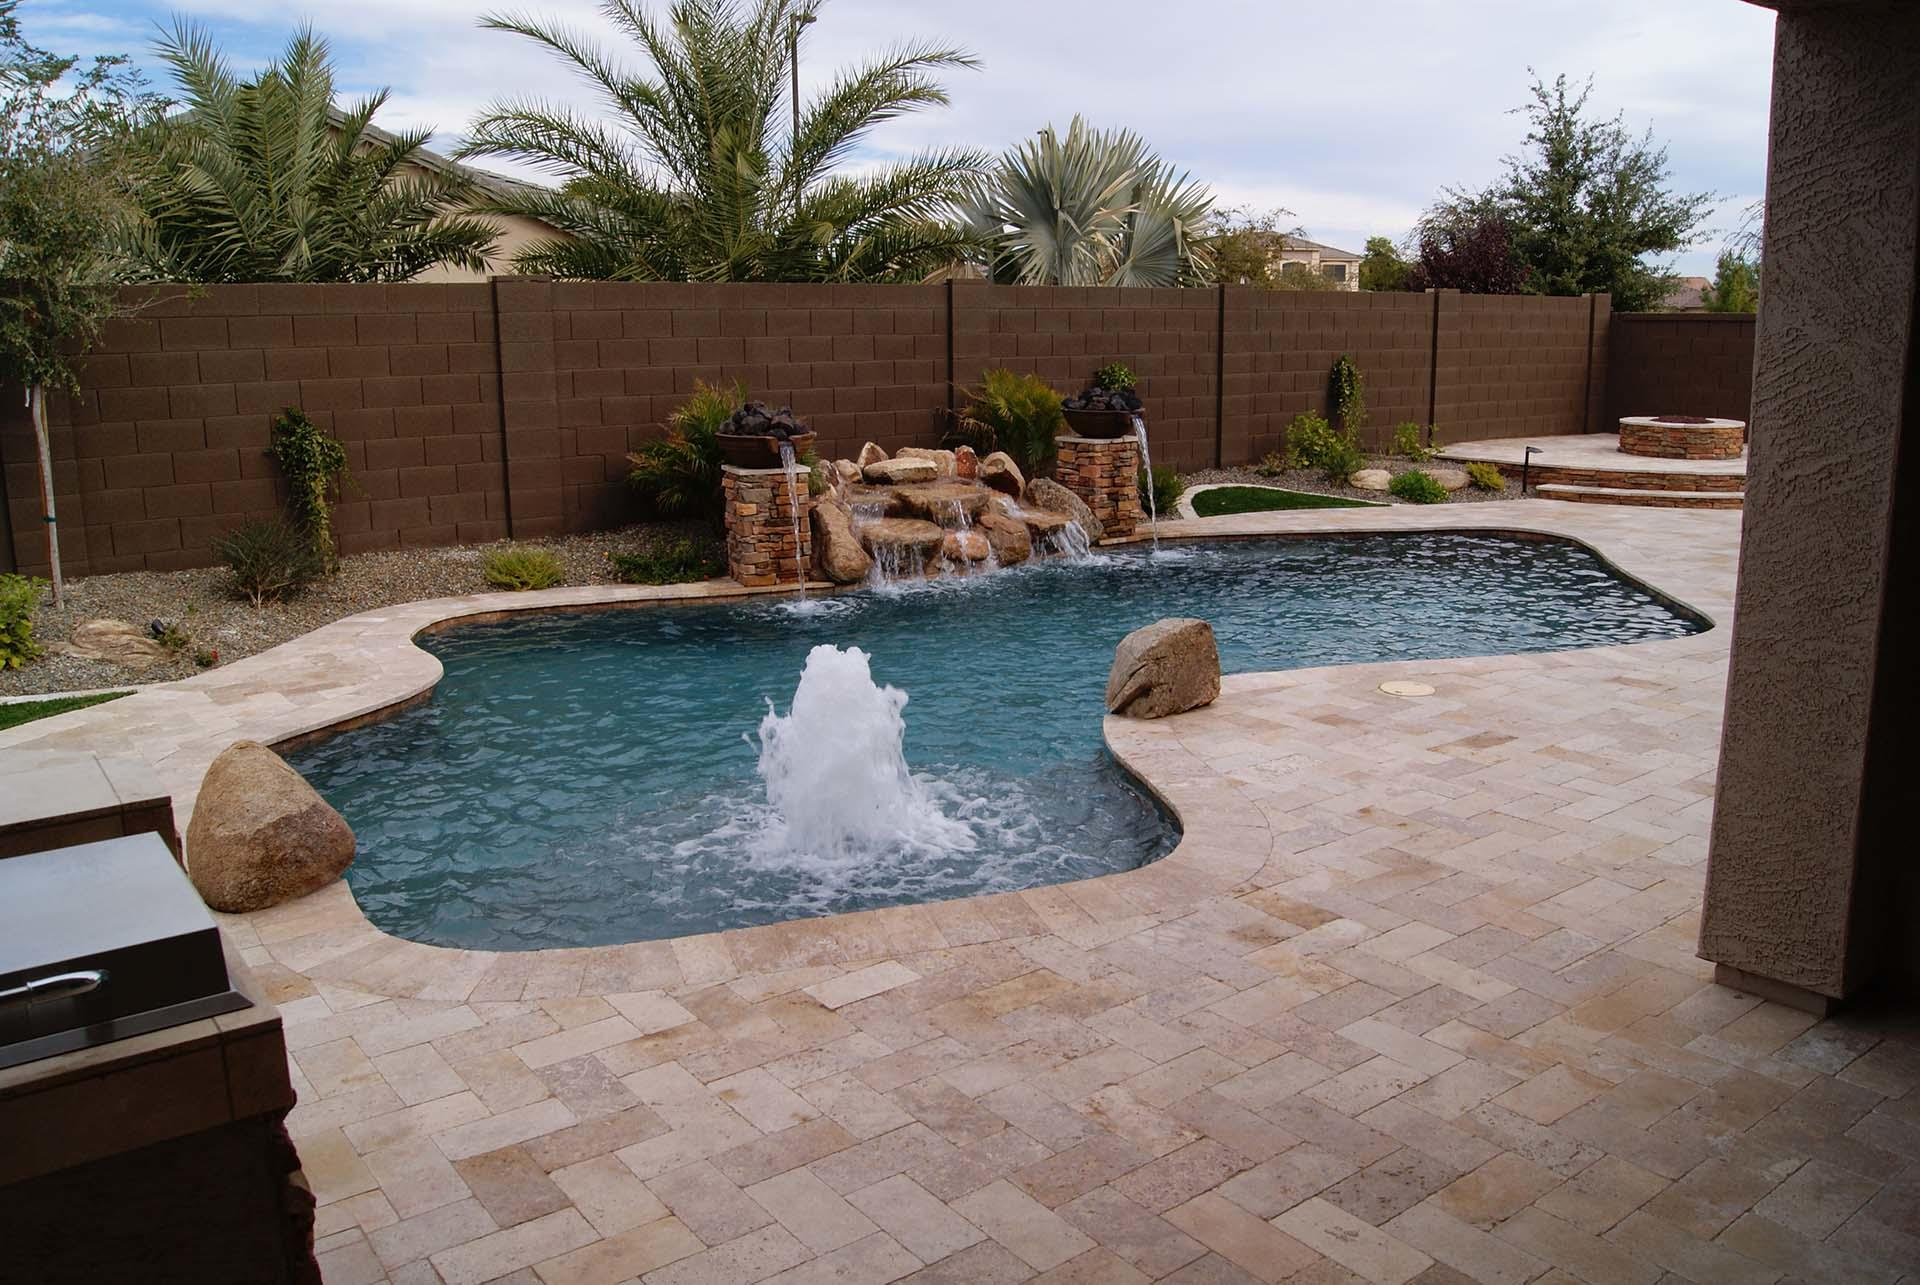 No Limit Pools & Spas image 66